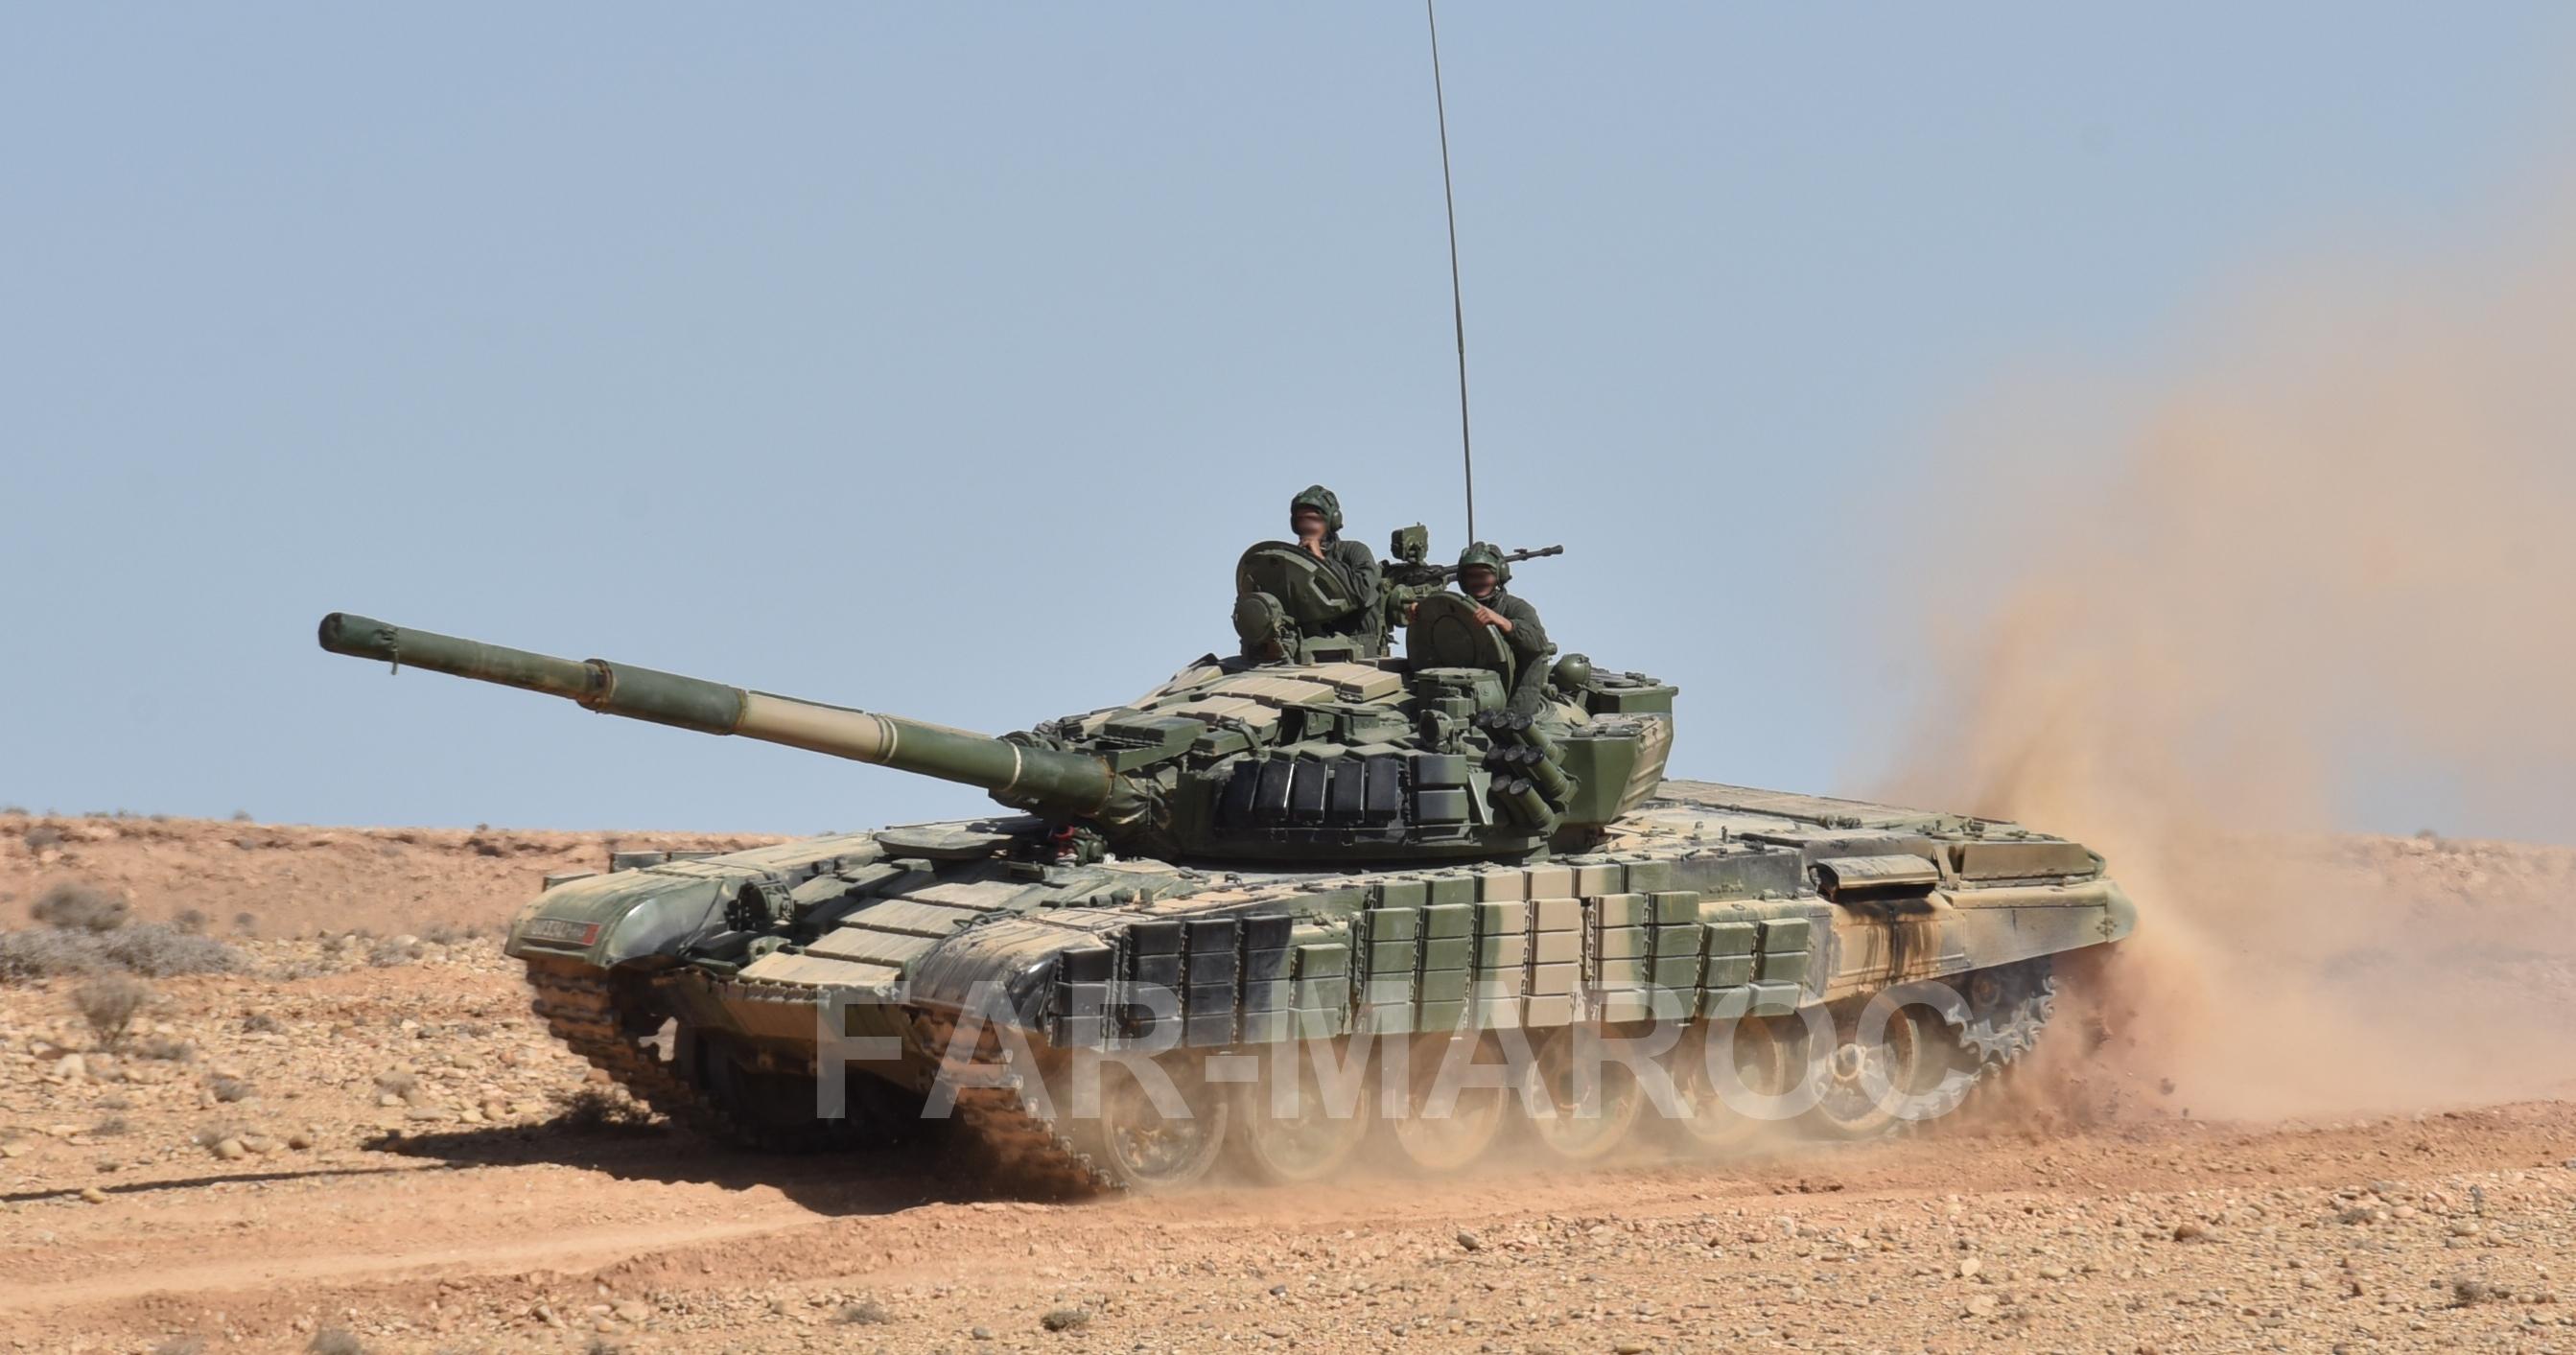 Chars T-72B/BK MArocains // Moroccan Army T-72B/BK Tanks - Page 4 49250468137_cd49d65b19_o